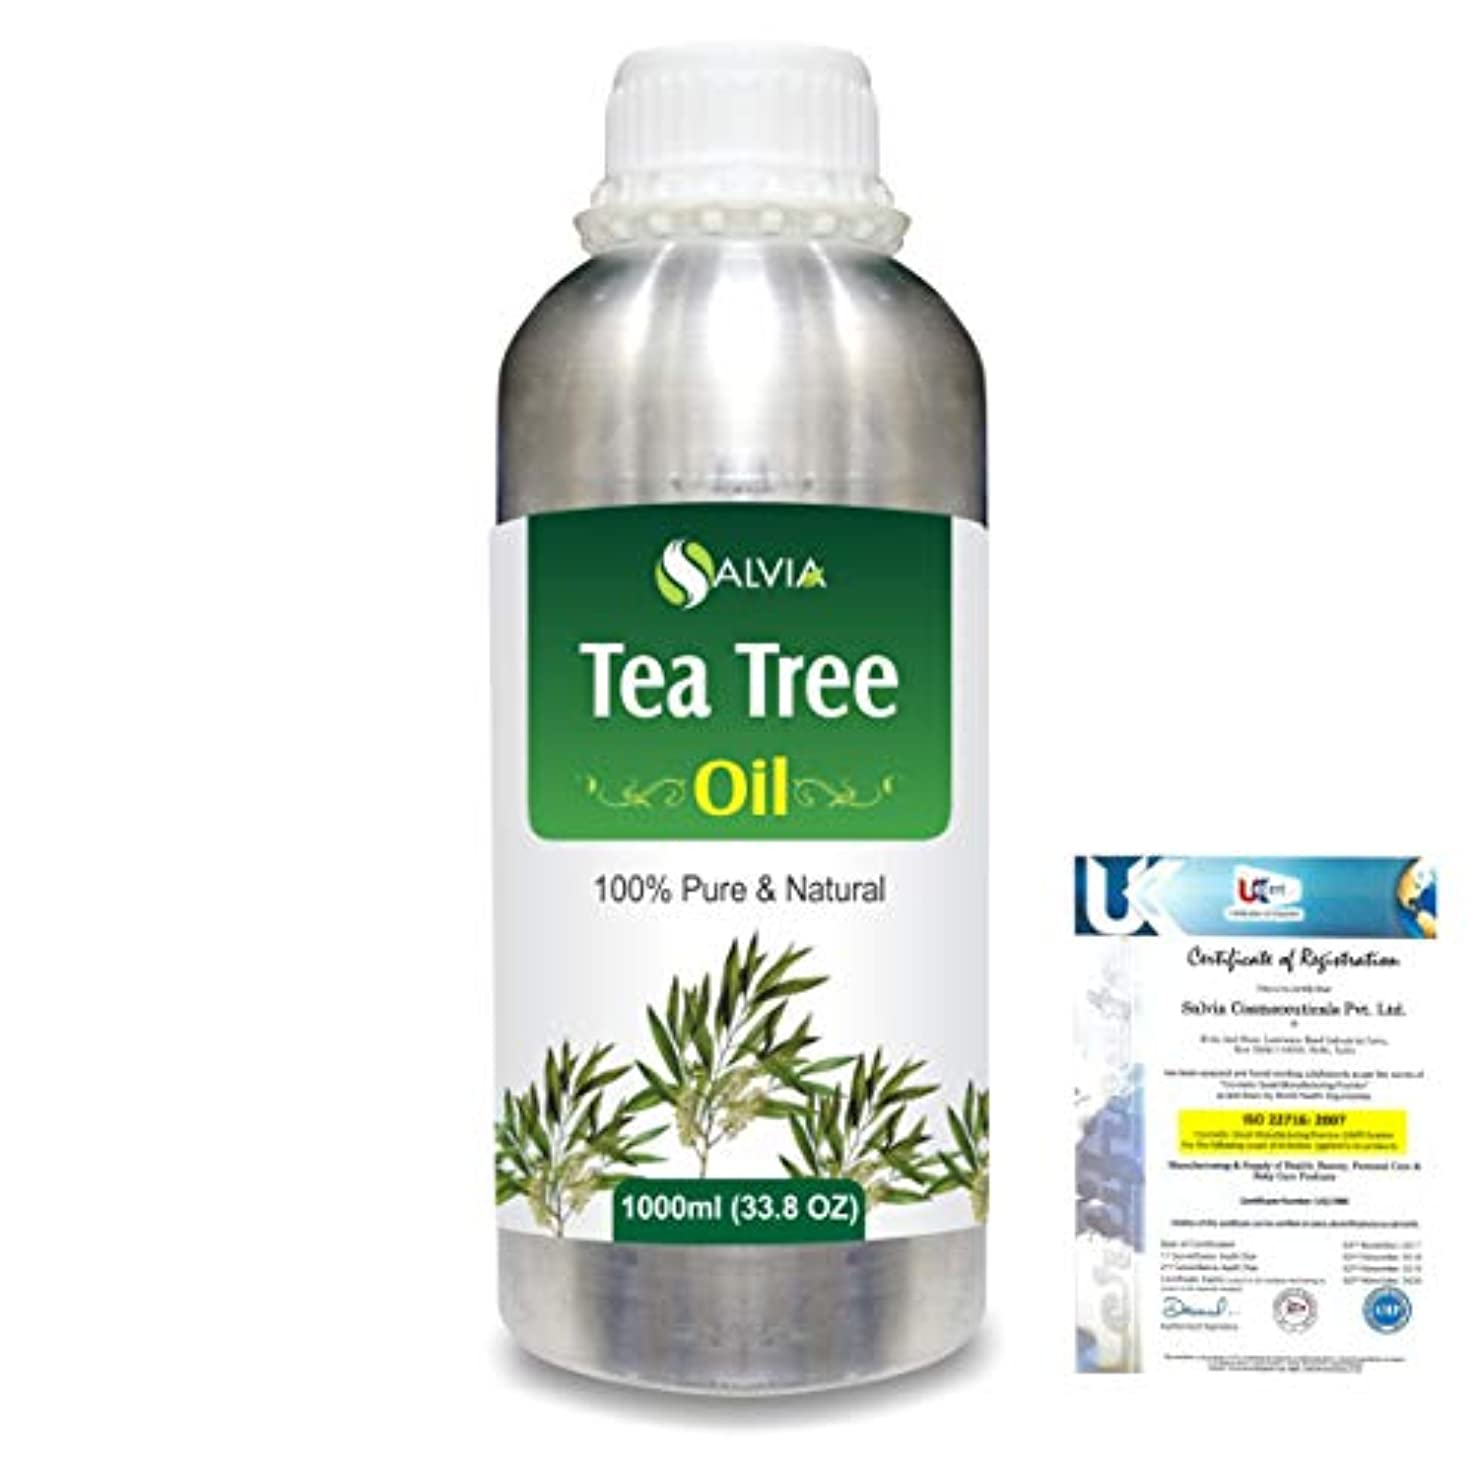 Tea Tree (Melaleuca alternifolia) 100% Natural Pure Essential Oil 1000ml/33.8fl.oz.